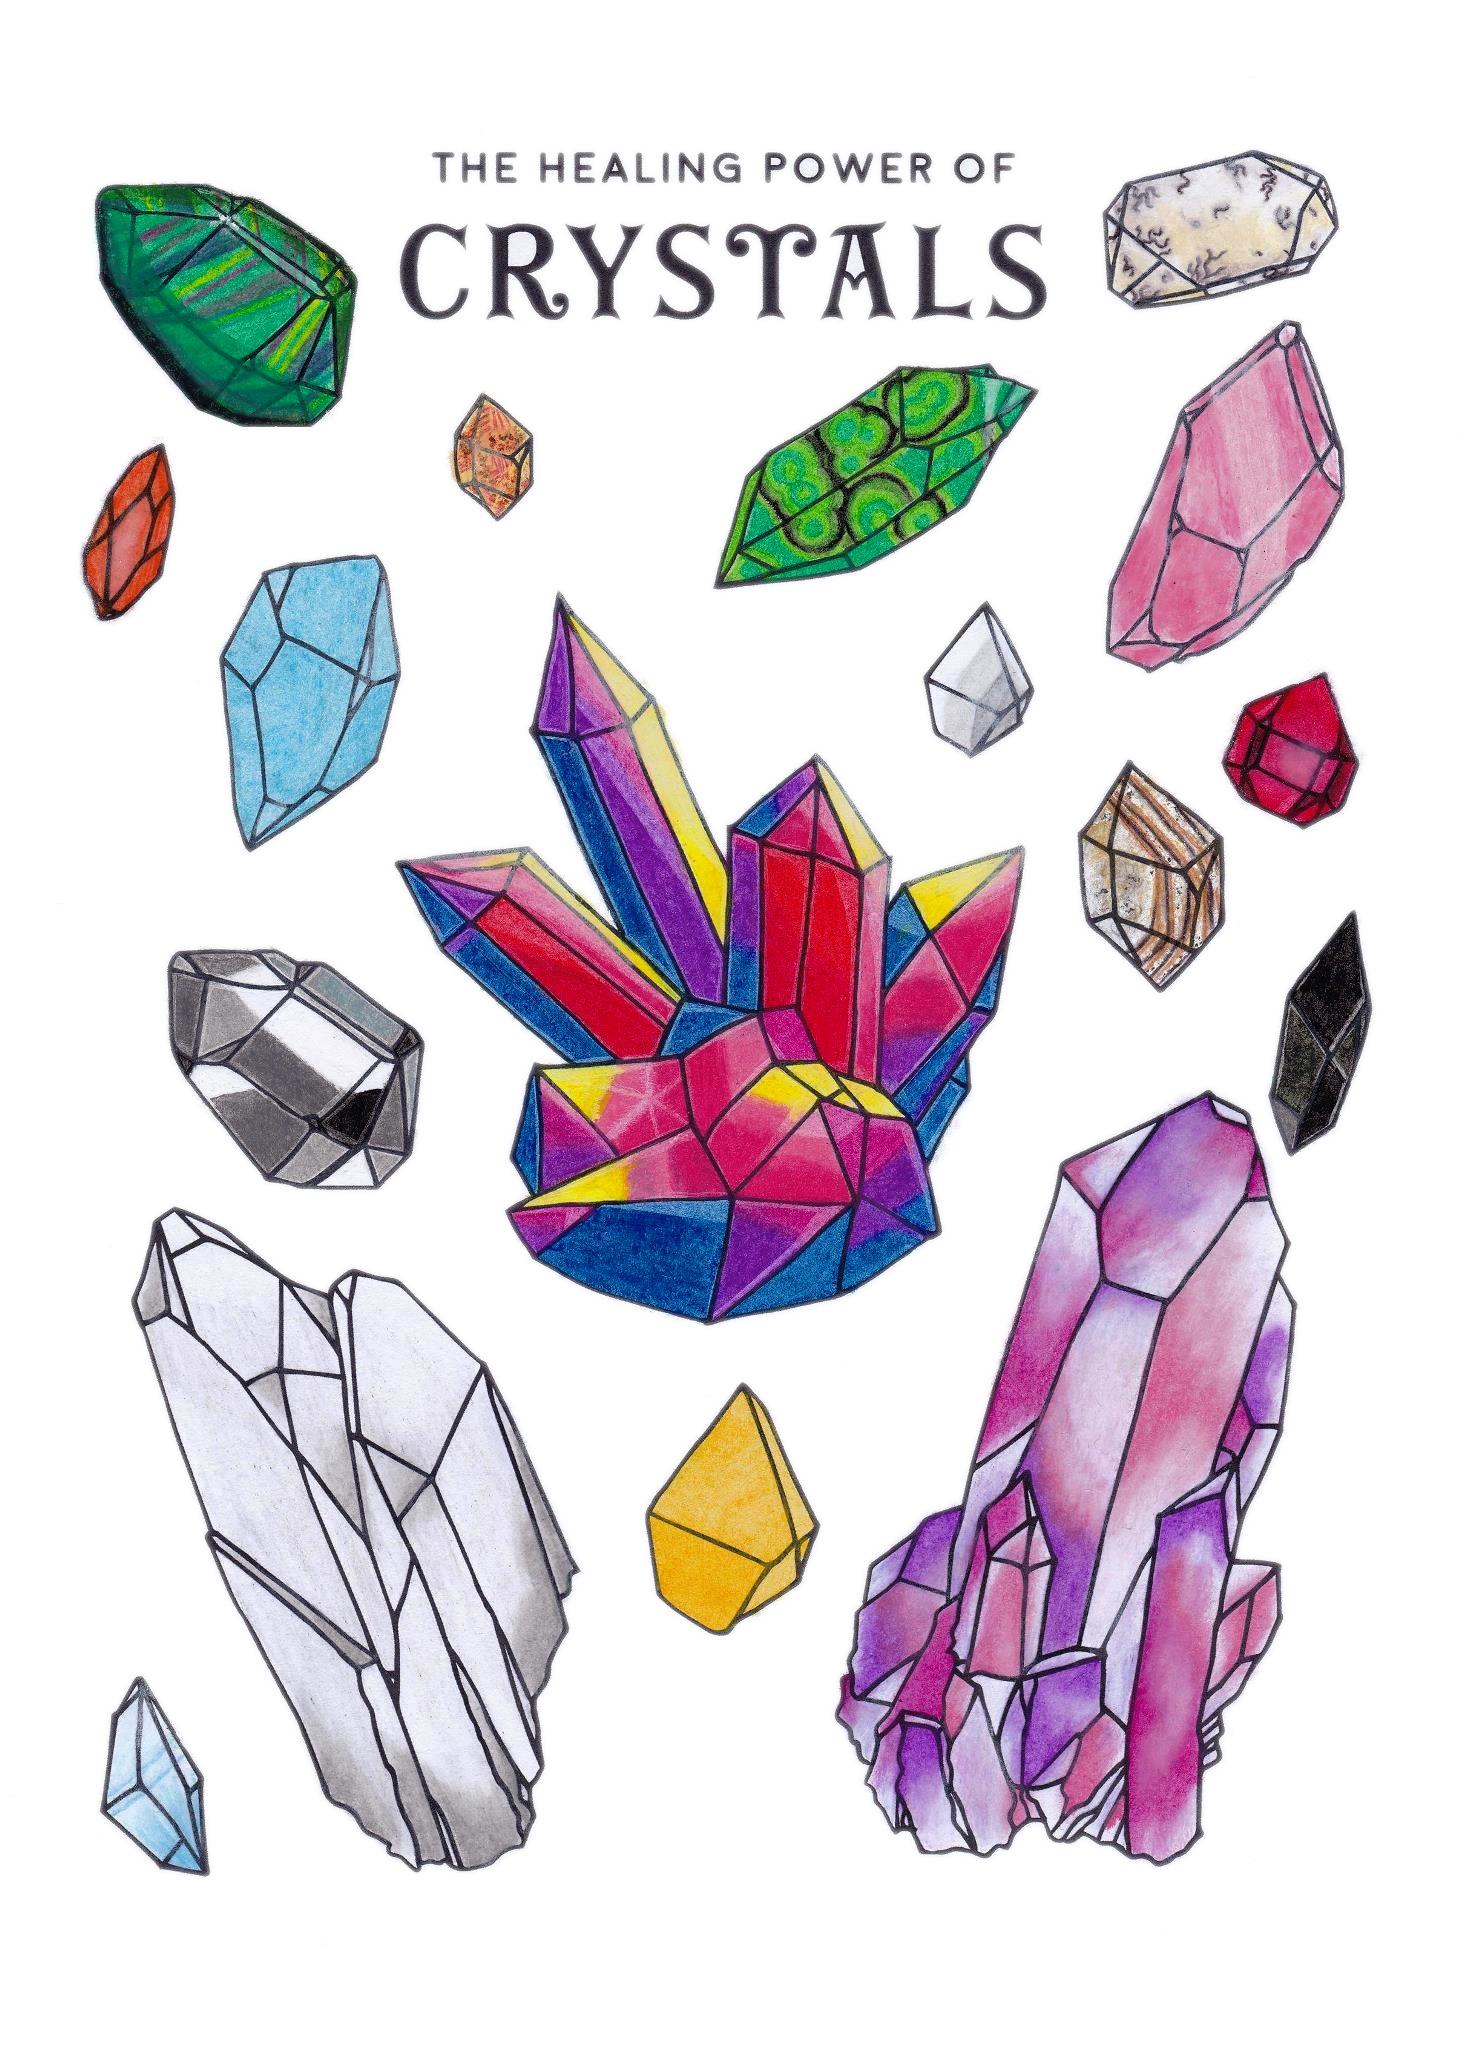 Crystal, Healing, Study, Art, Design, Free, Wallpaper, hand colored, hand coloured, Background, Download, Mobile, Desktop